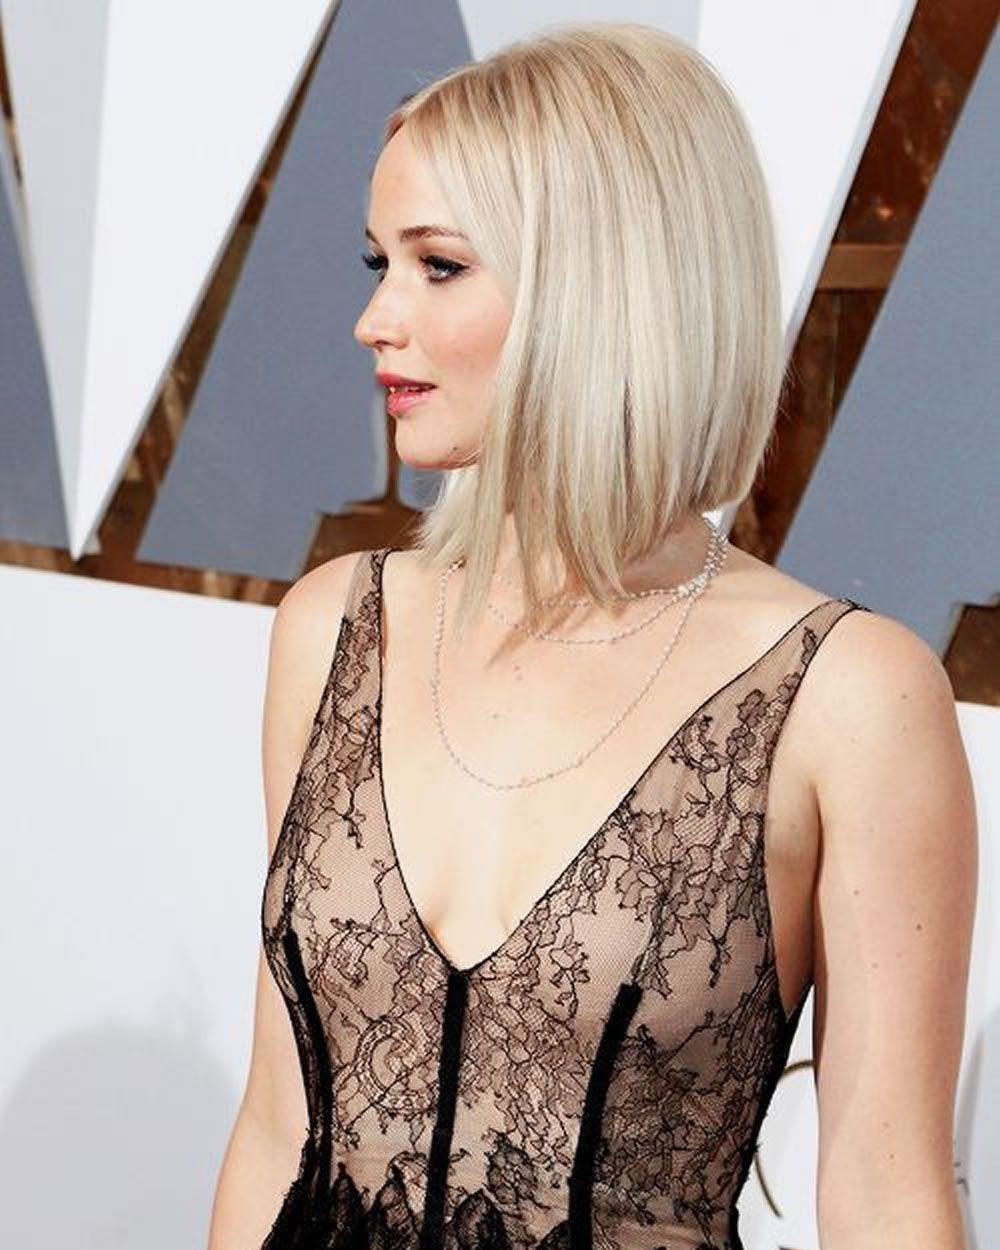 Bob Haarschnitt 2018 Trendy Bob Frisur Designs Im Jahr 2017 Jennifer Lawrence Hair Hair Styles Jennifer Lawrence Blonde